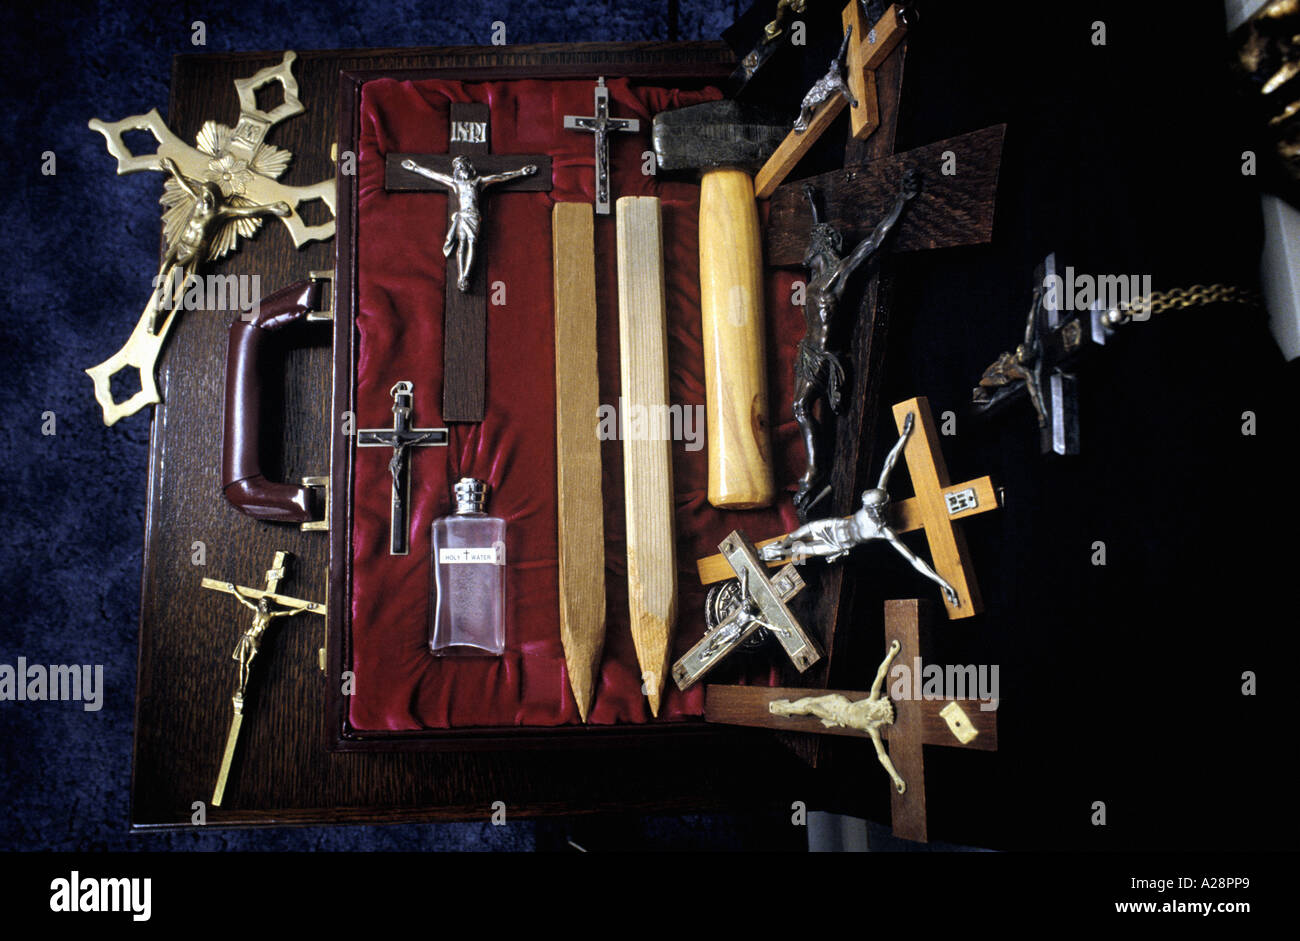 a vampire slayers kit at Bishop Sean Manchester's house England Stock Photo